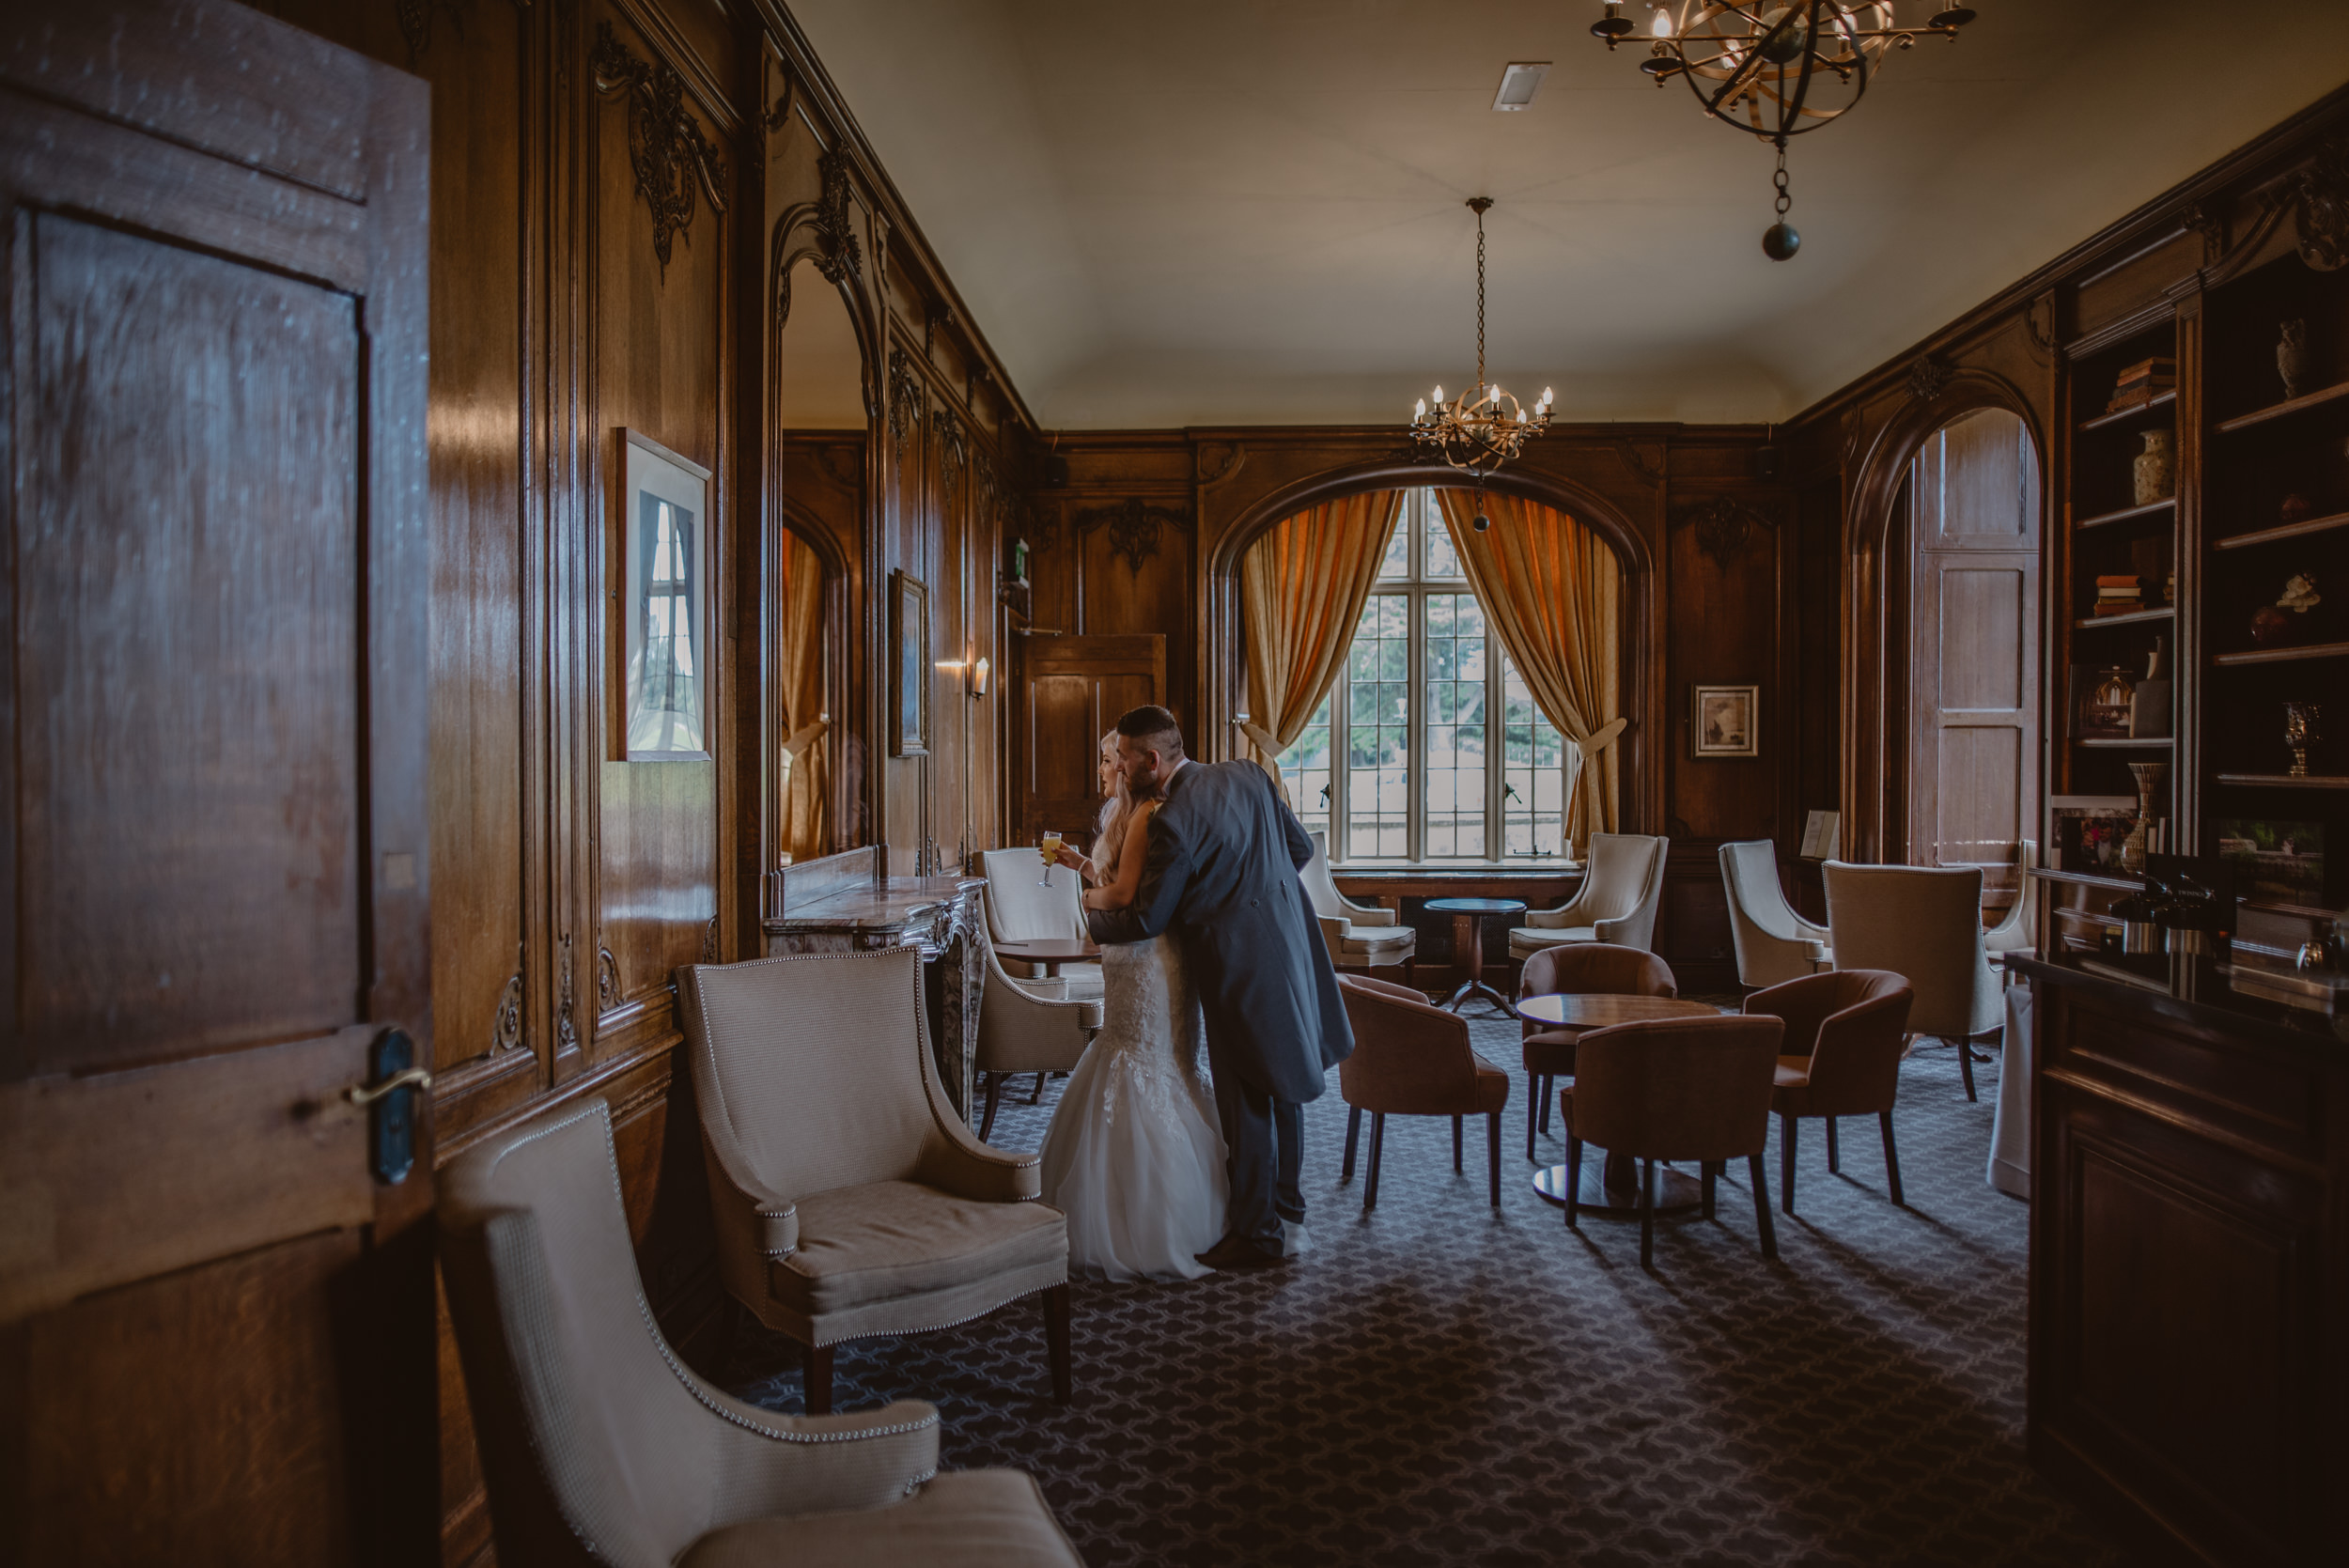 Rachel-and-James-Wedding-Horsley-Towers-State-Manu-Mendoza-Wedding-Photography-302.jpg